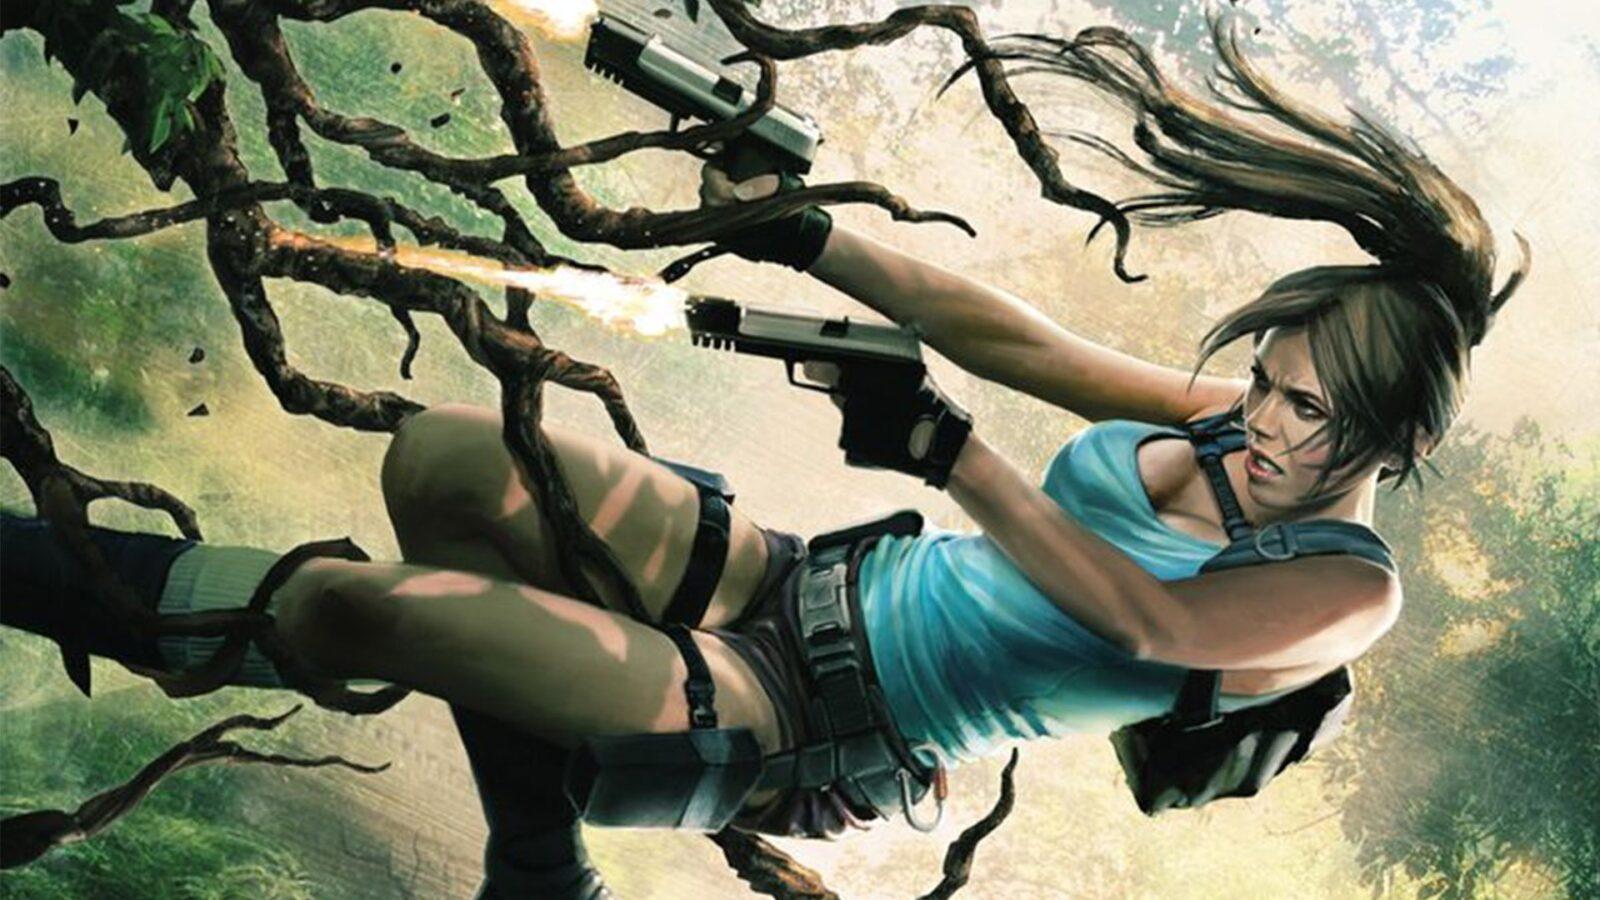 Lara croft horse nackt movies